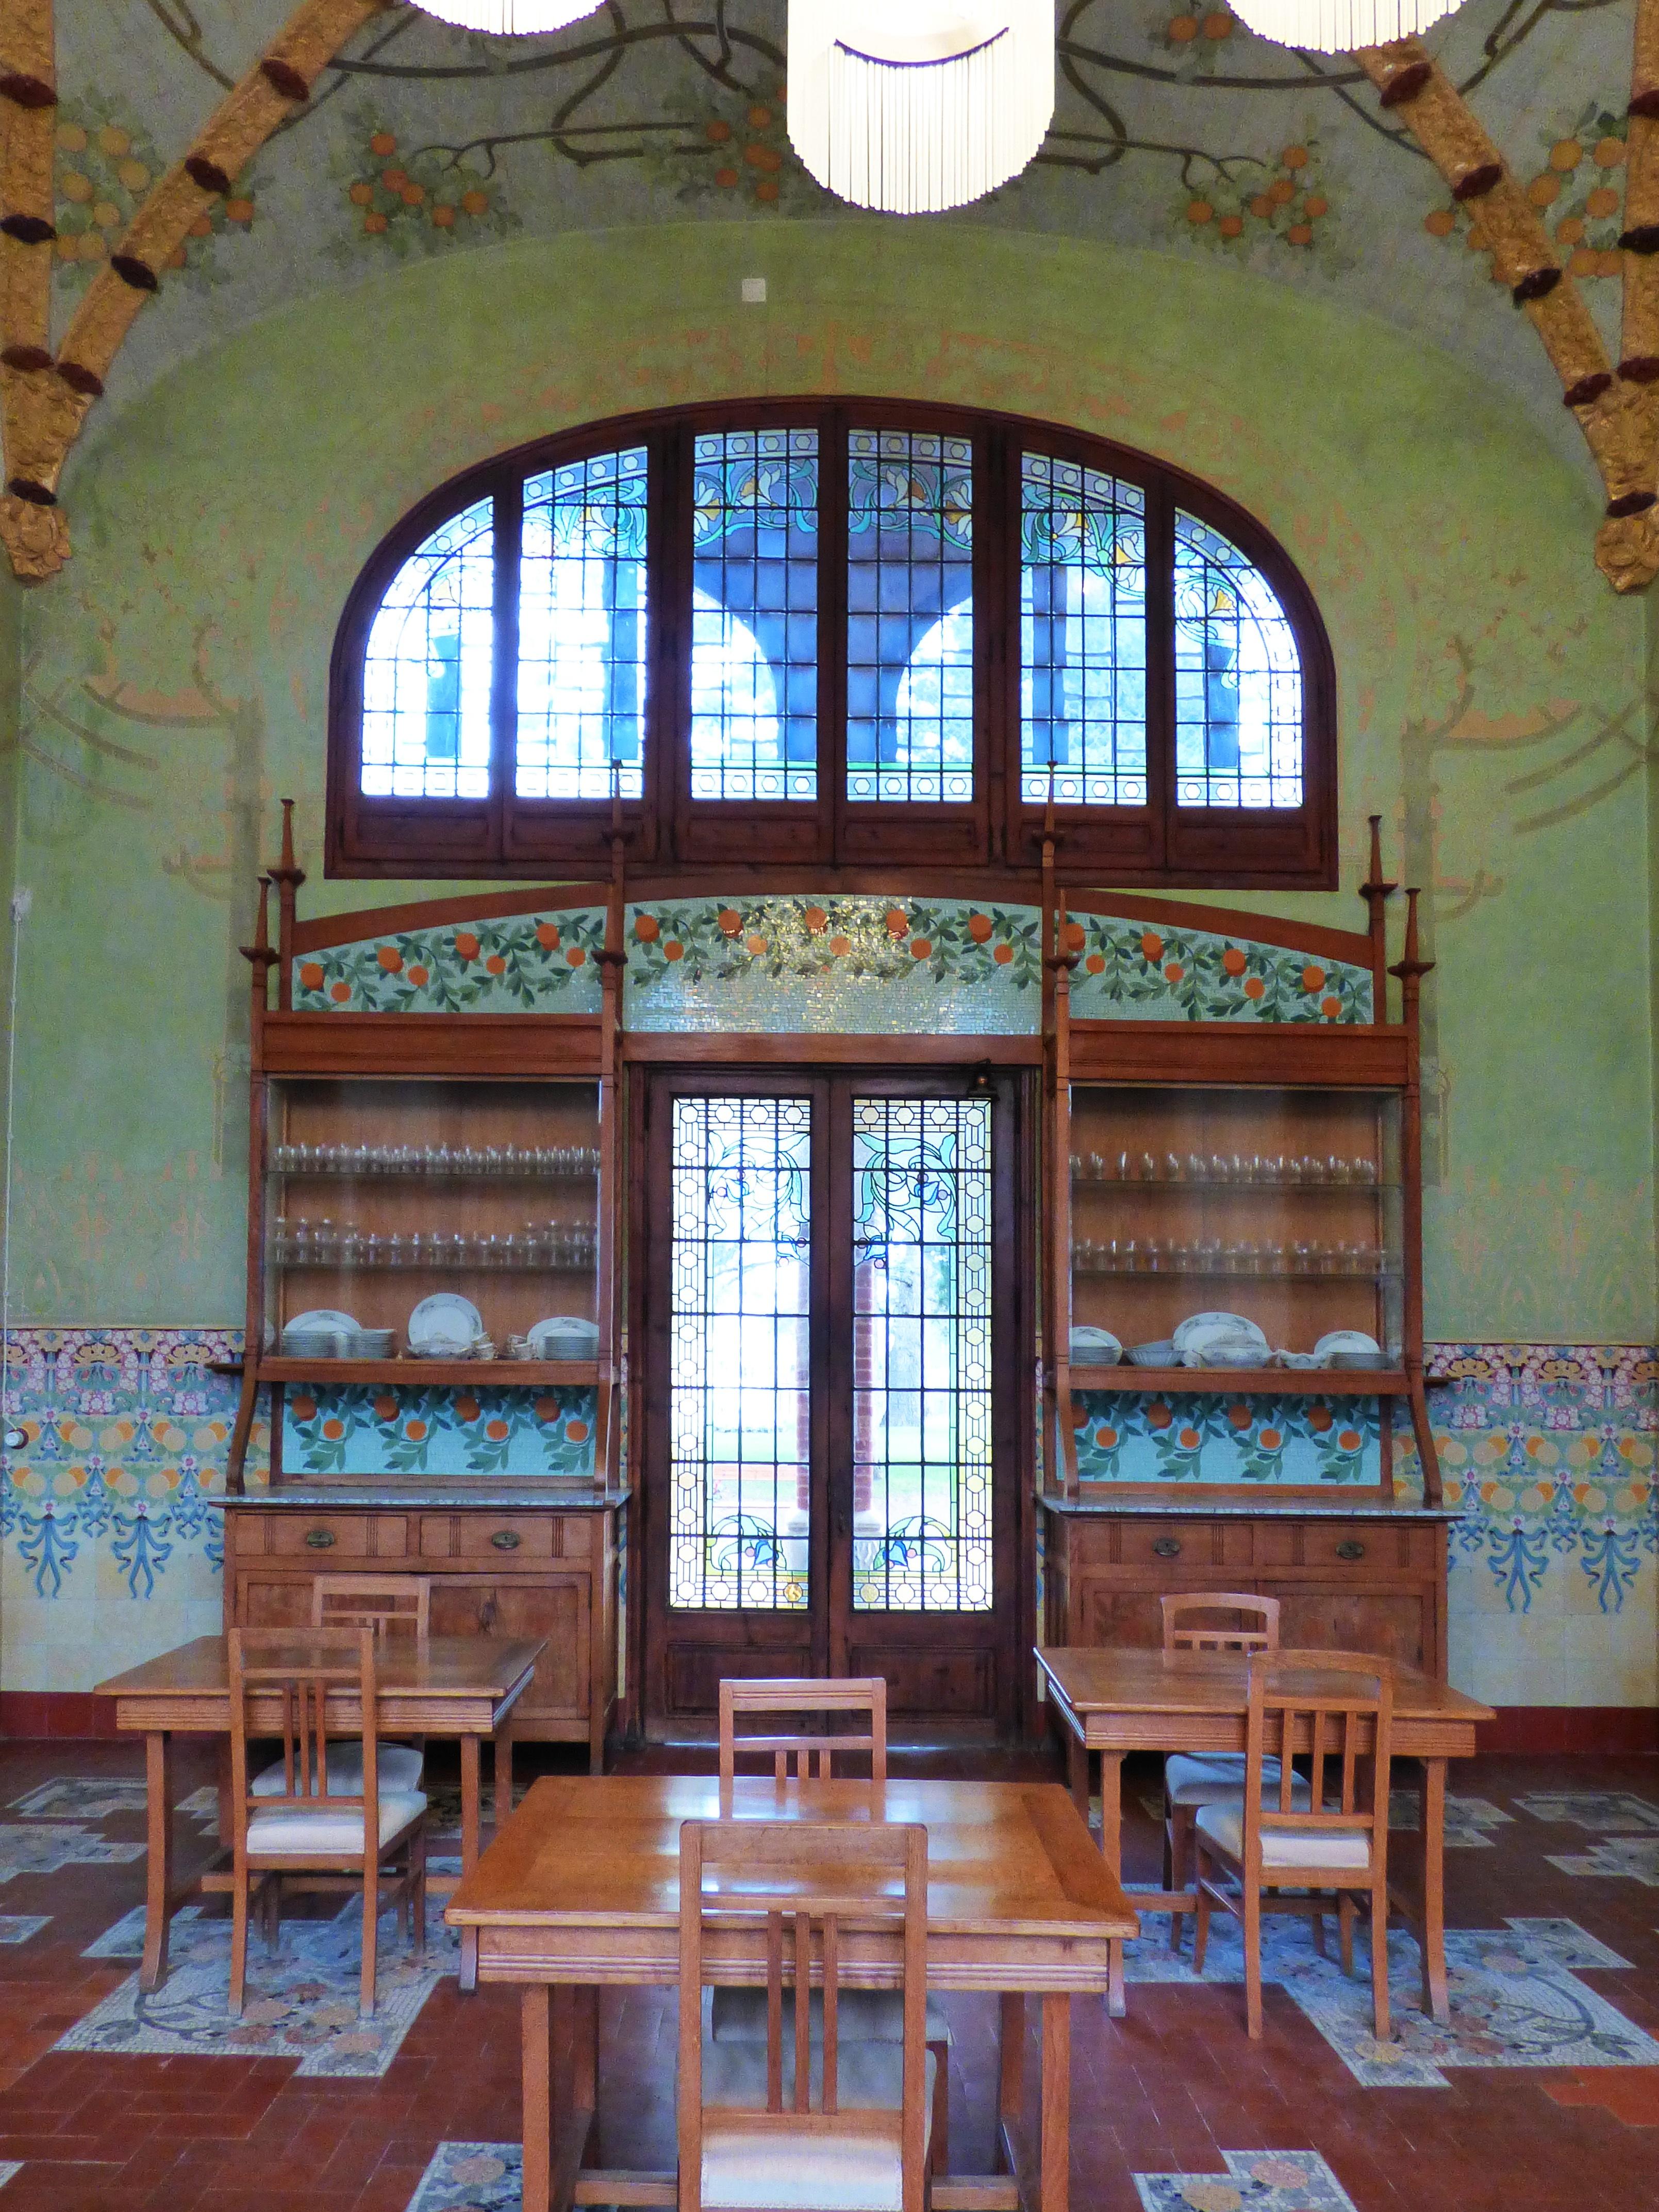 Fotos Gratis Arquitectura Palacio Ventana Edificio Casa  # Muebles Catalan